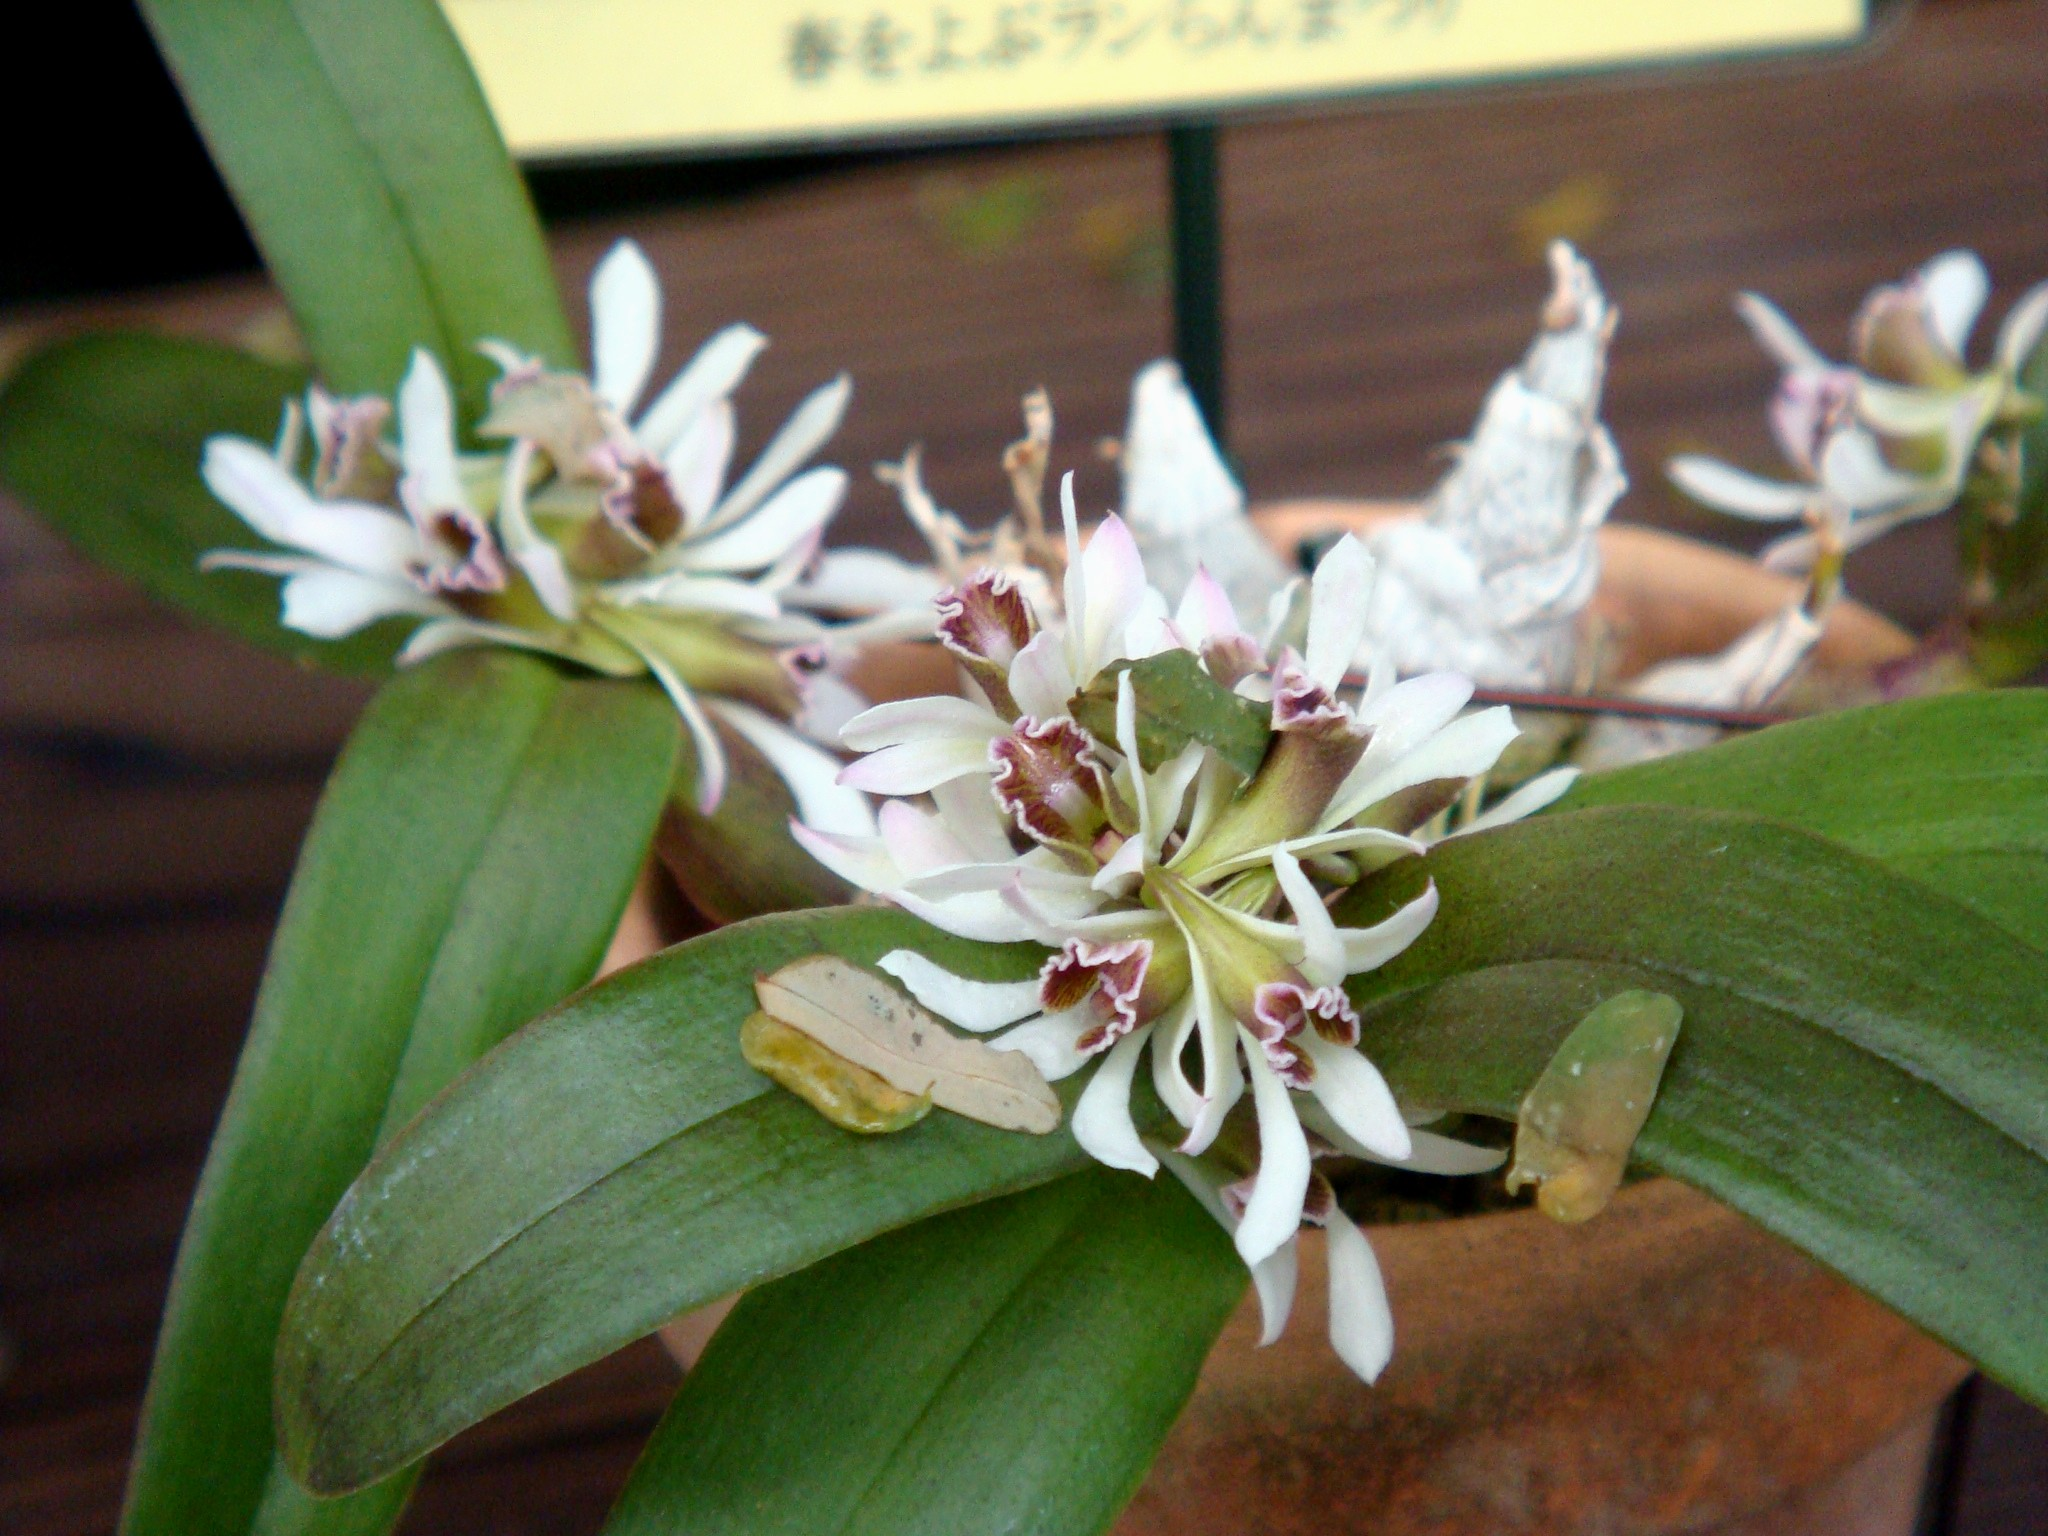 http://orchids.la.coocan.jp/Dendrobium/Dendrobium%20peguanum/DSC00983.JPG